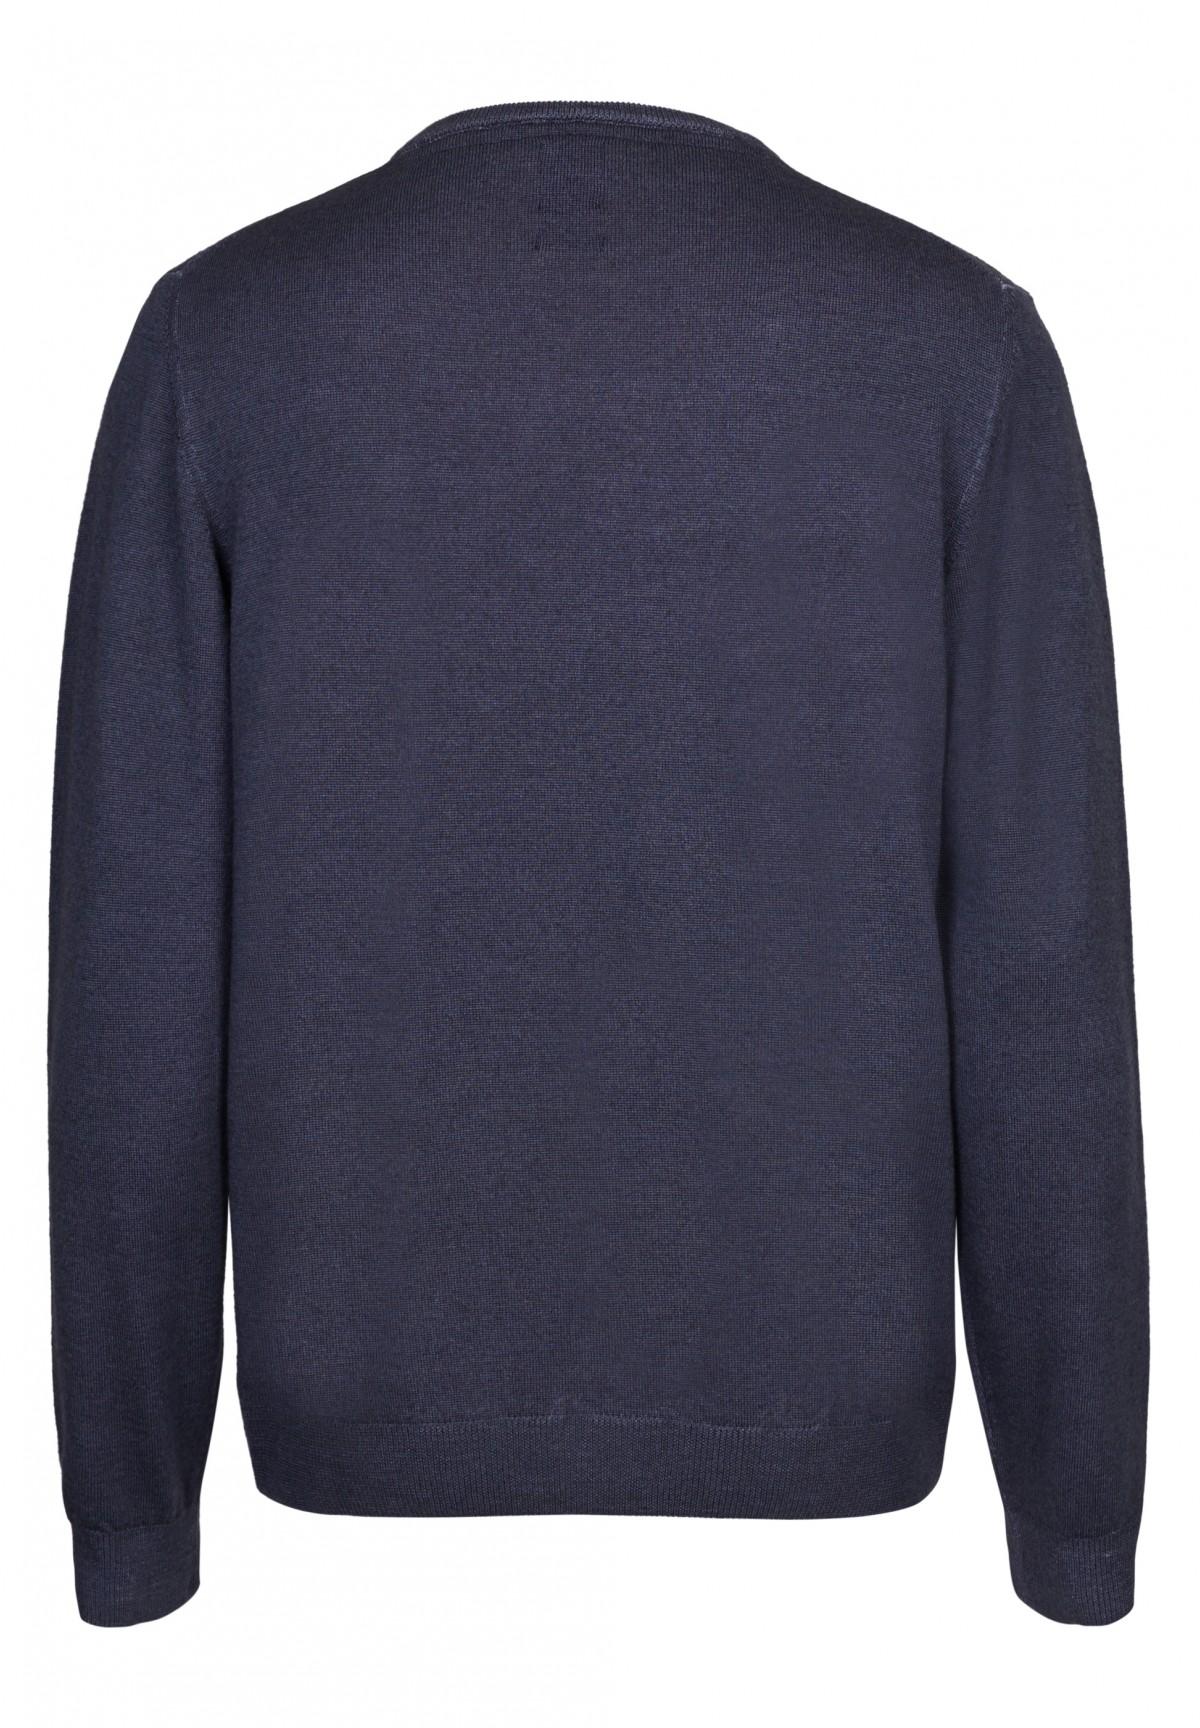 Pull col Rond 100% laine mérinos /